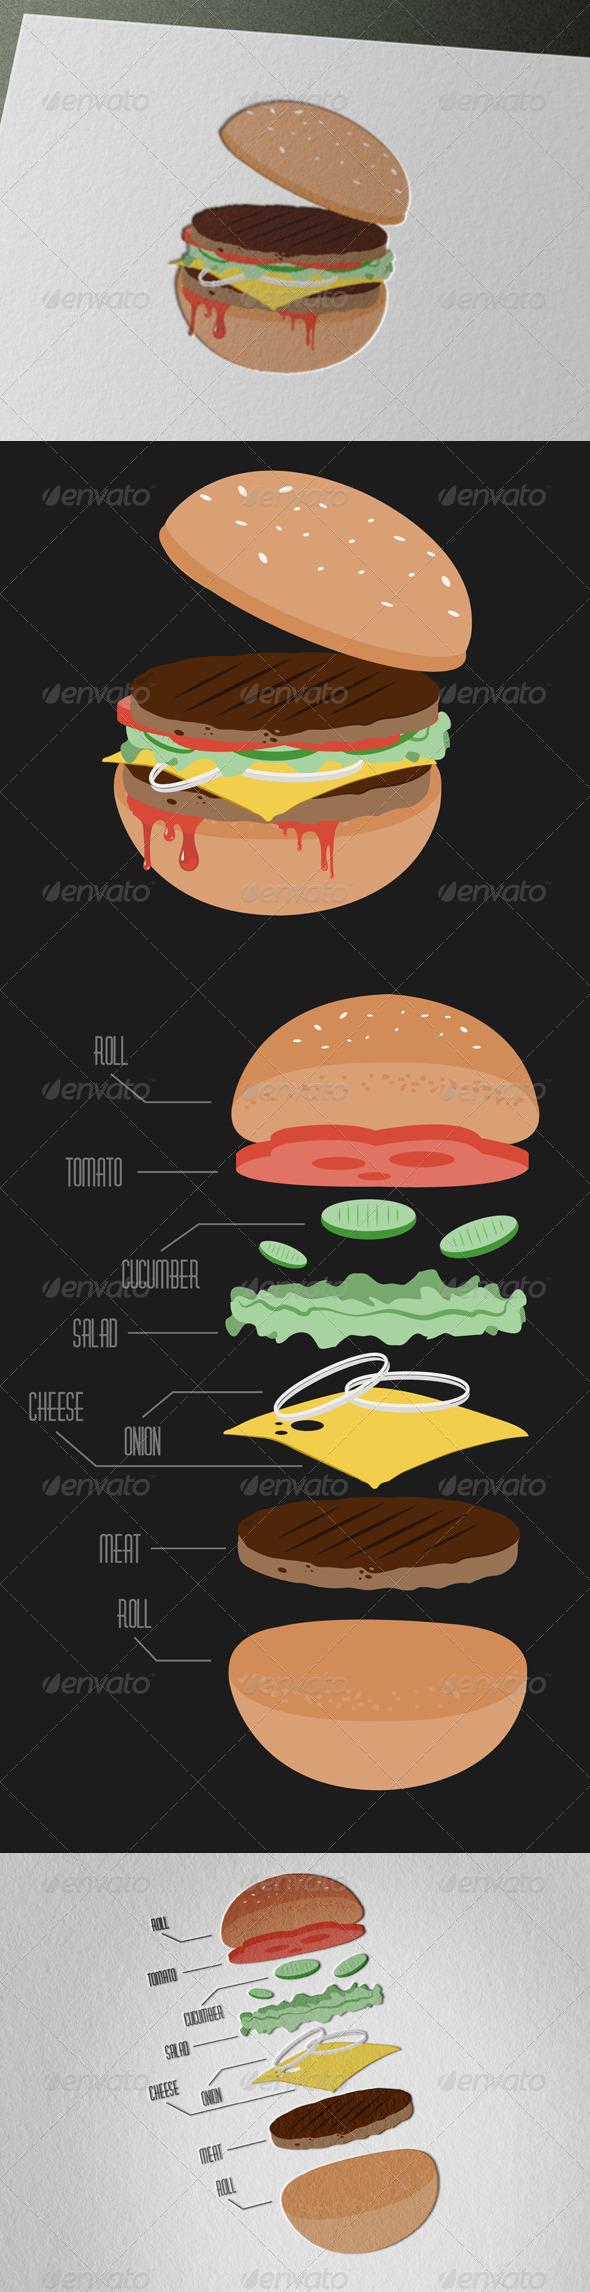 GraphicRiver Tasty Vintage Hamburger 4911072